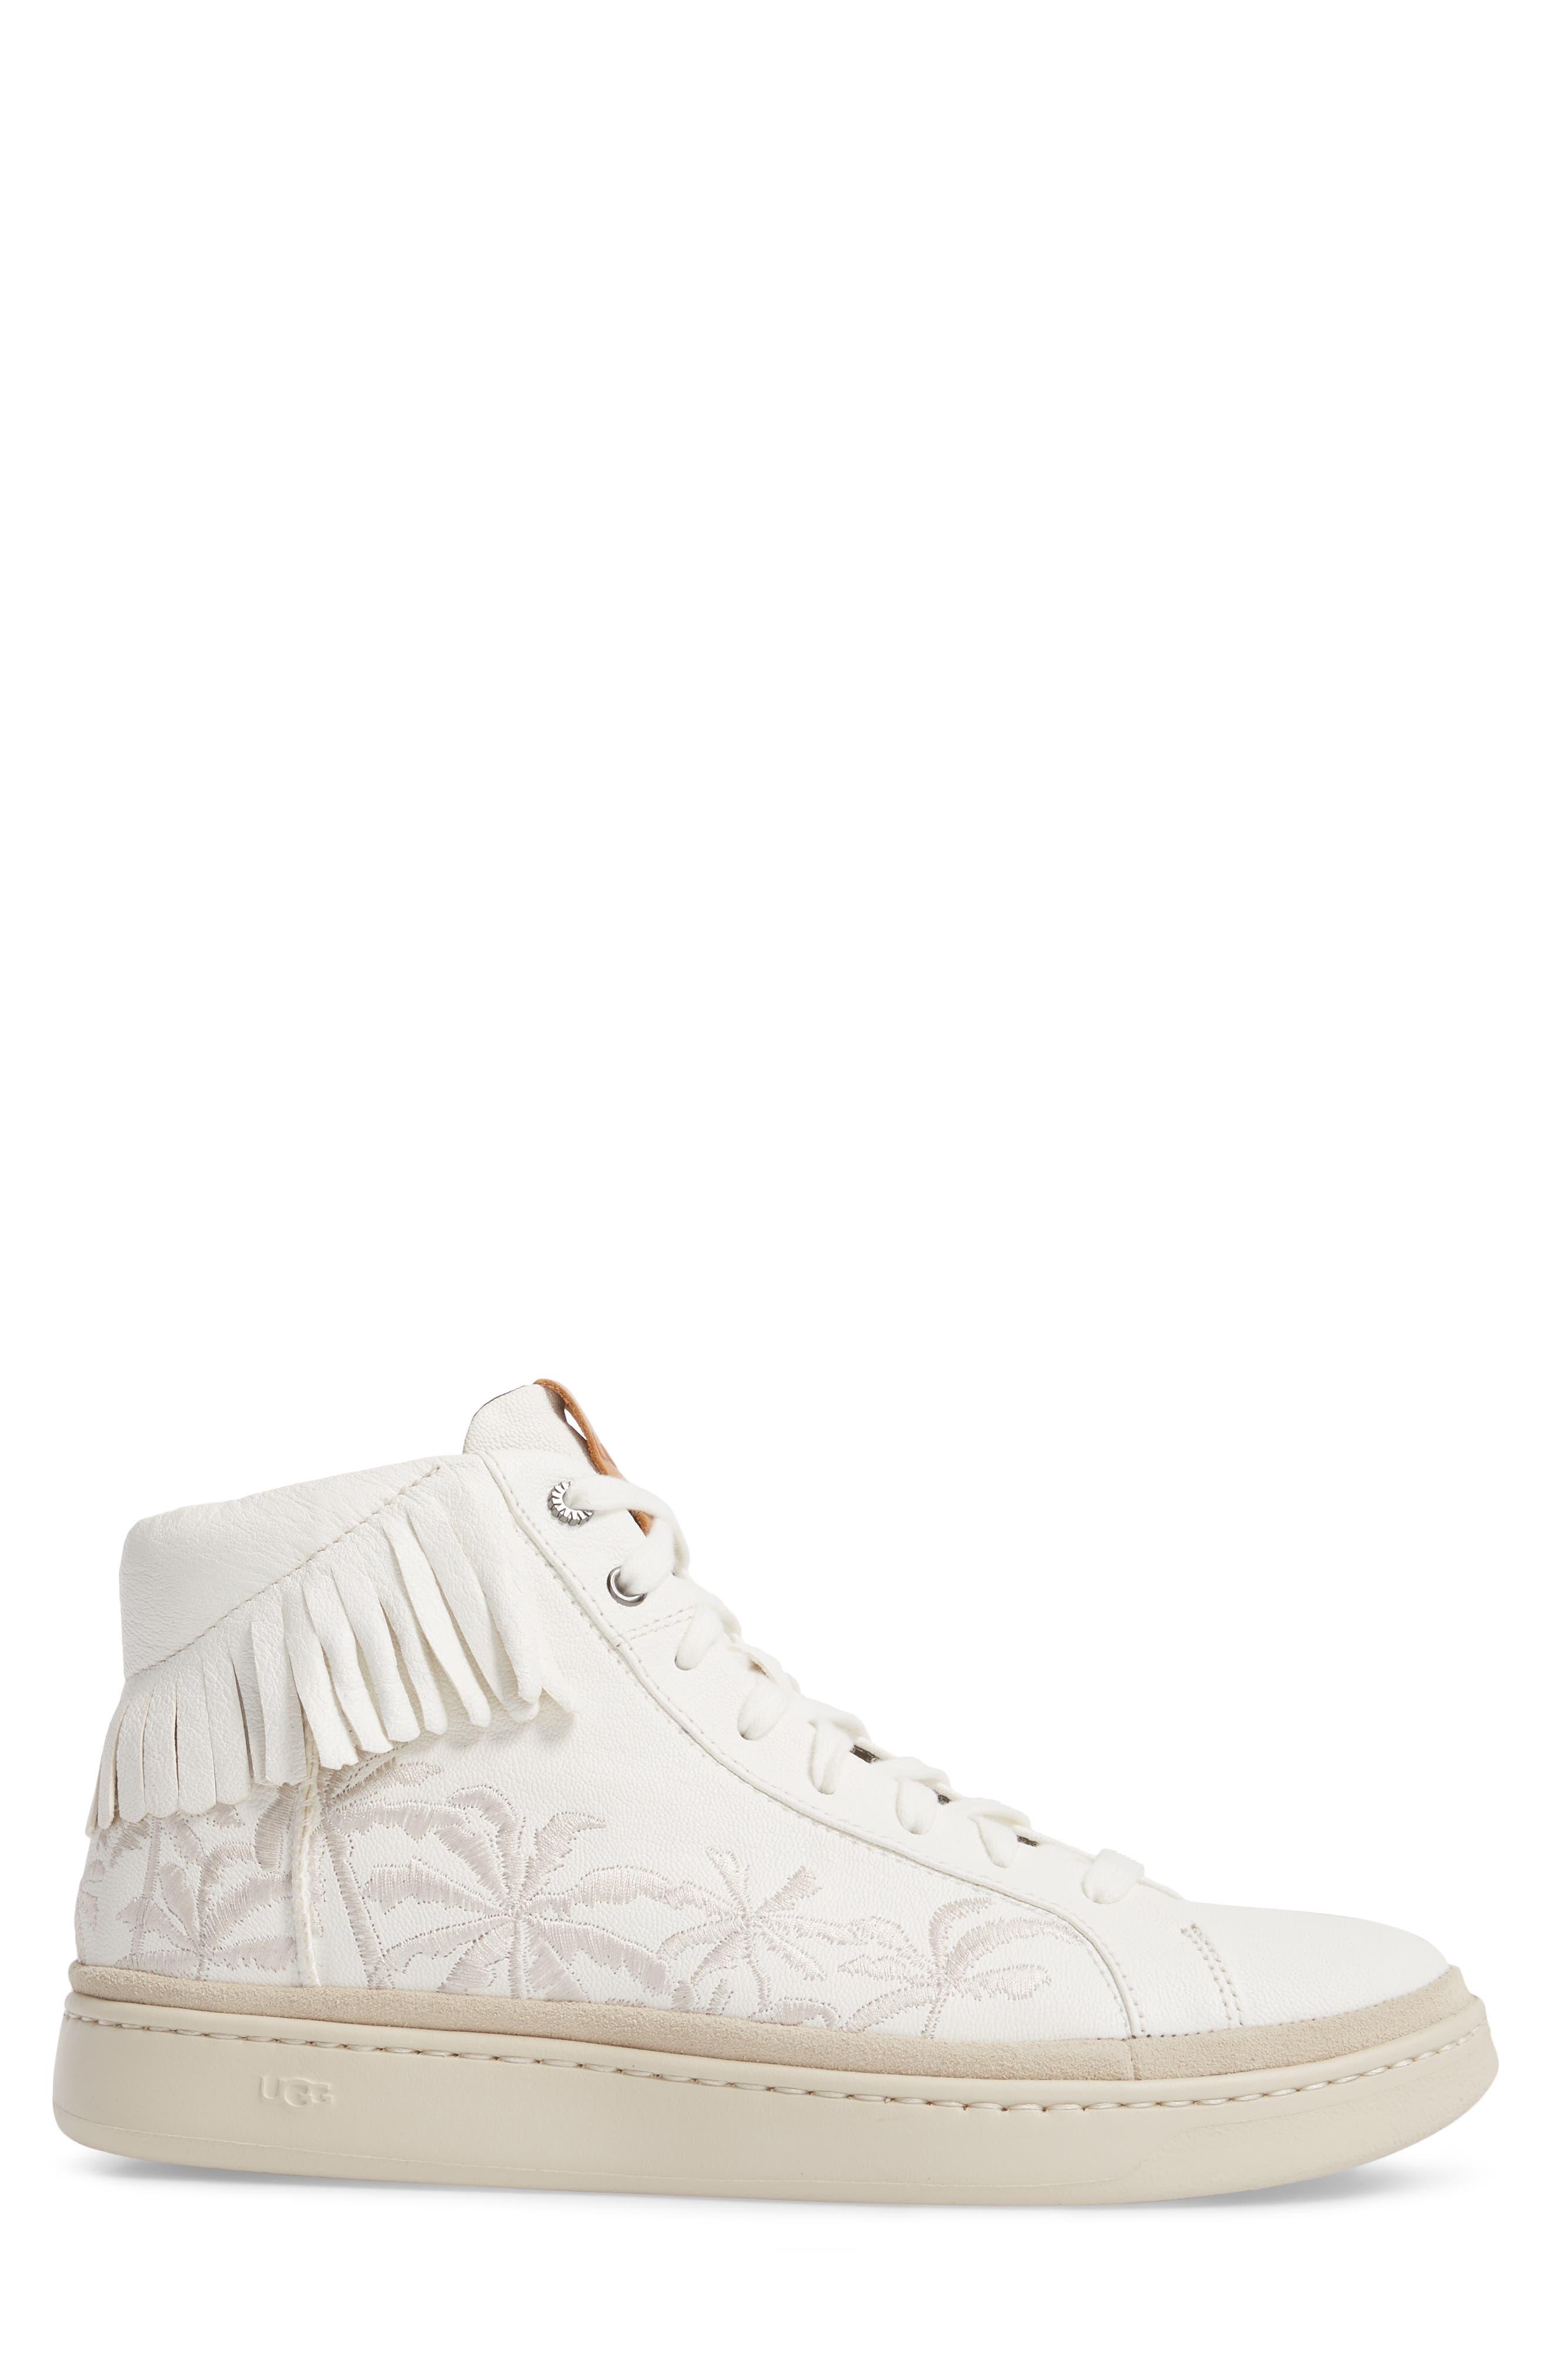 Cali Fringe High Top Sneaker,                             Alternate thumbnail 3, color,                             100